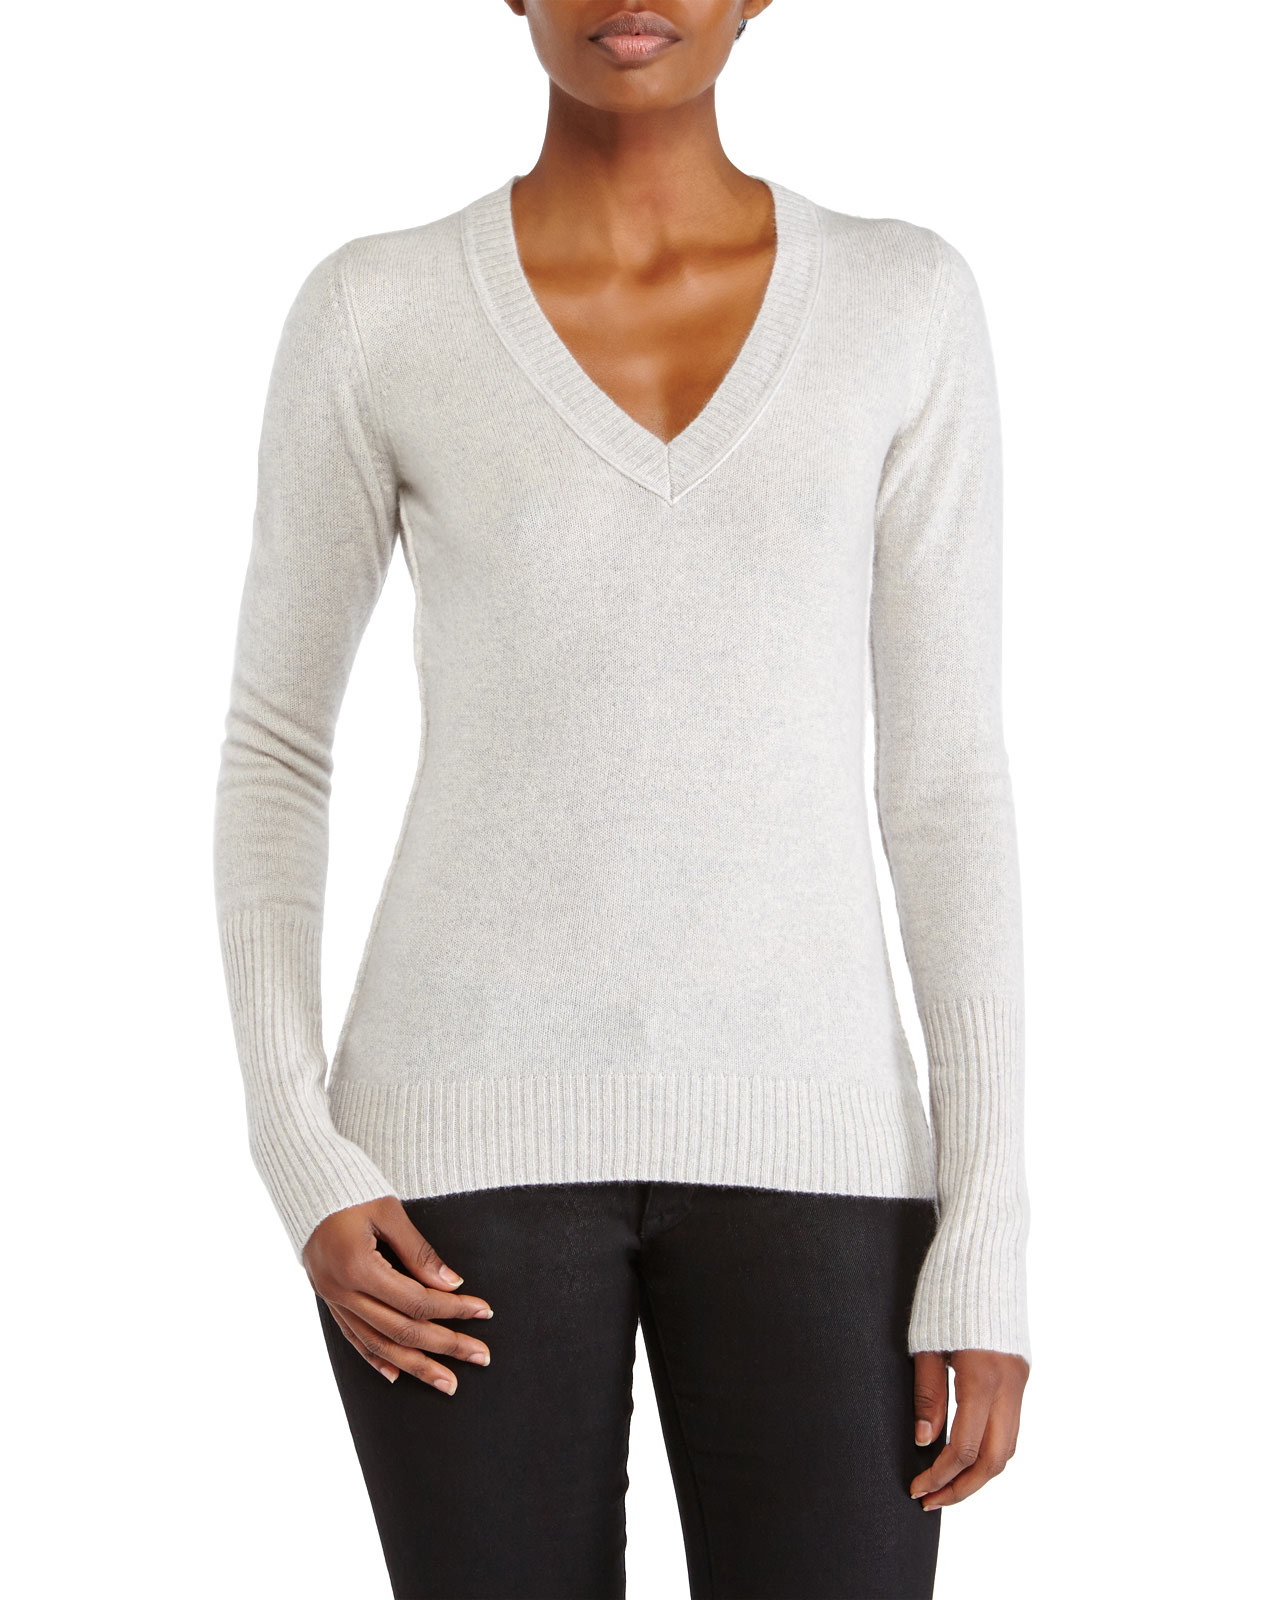 Grey Cashmere V Neck Sweater 103